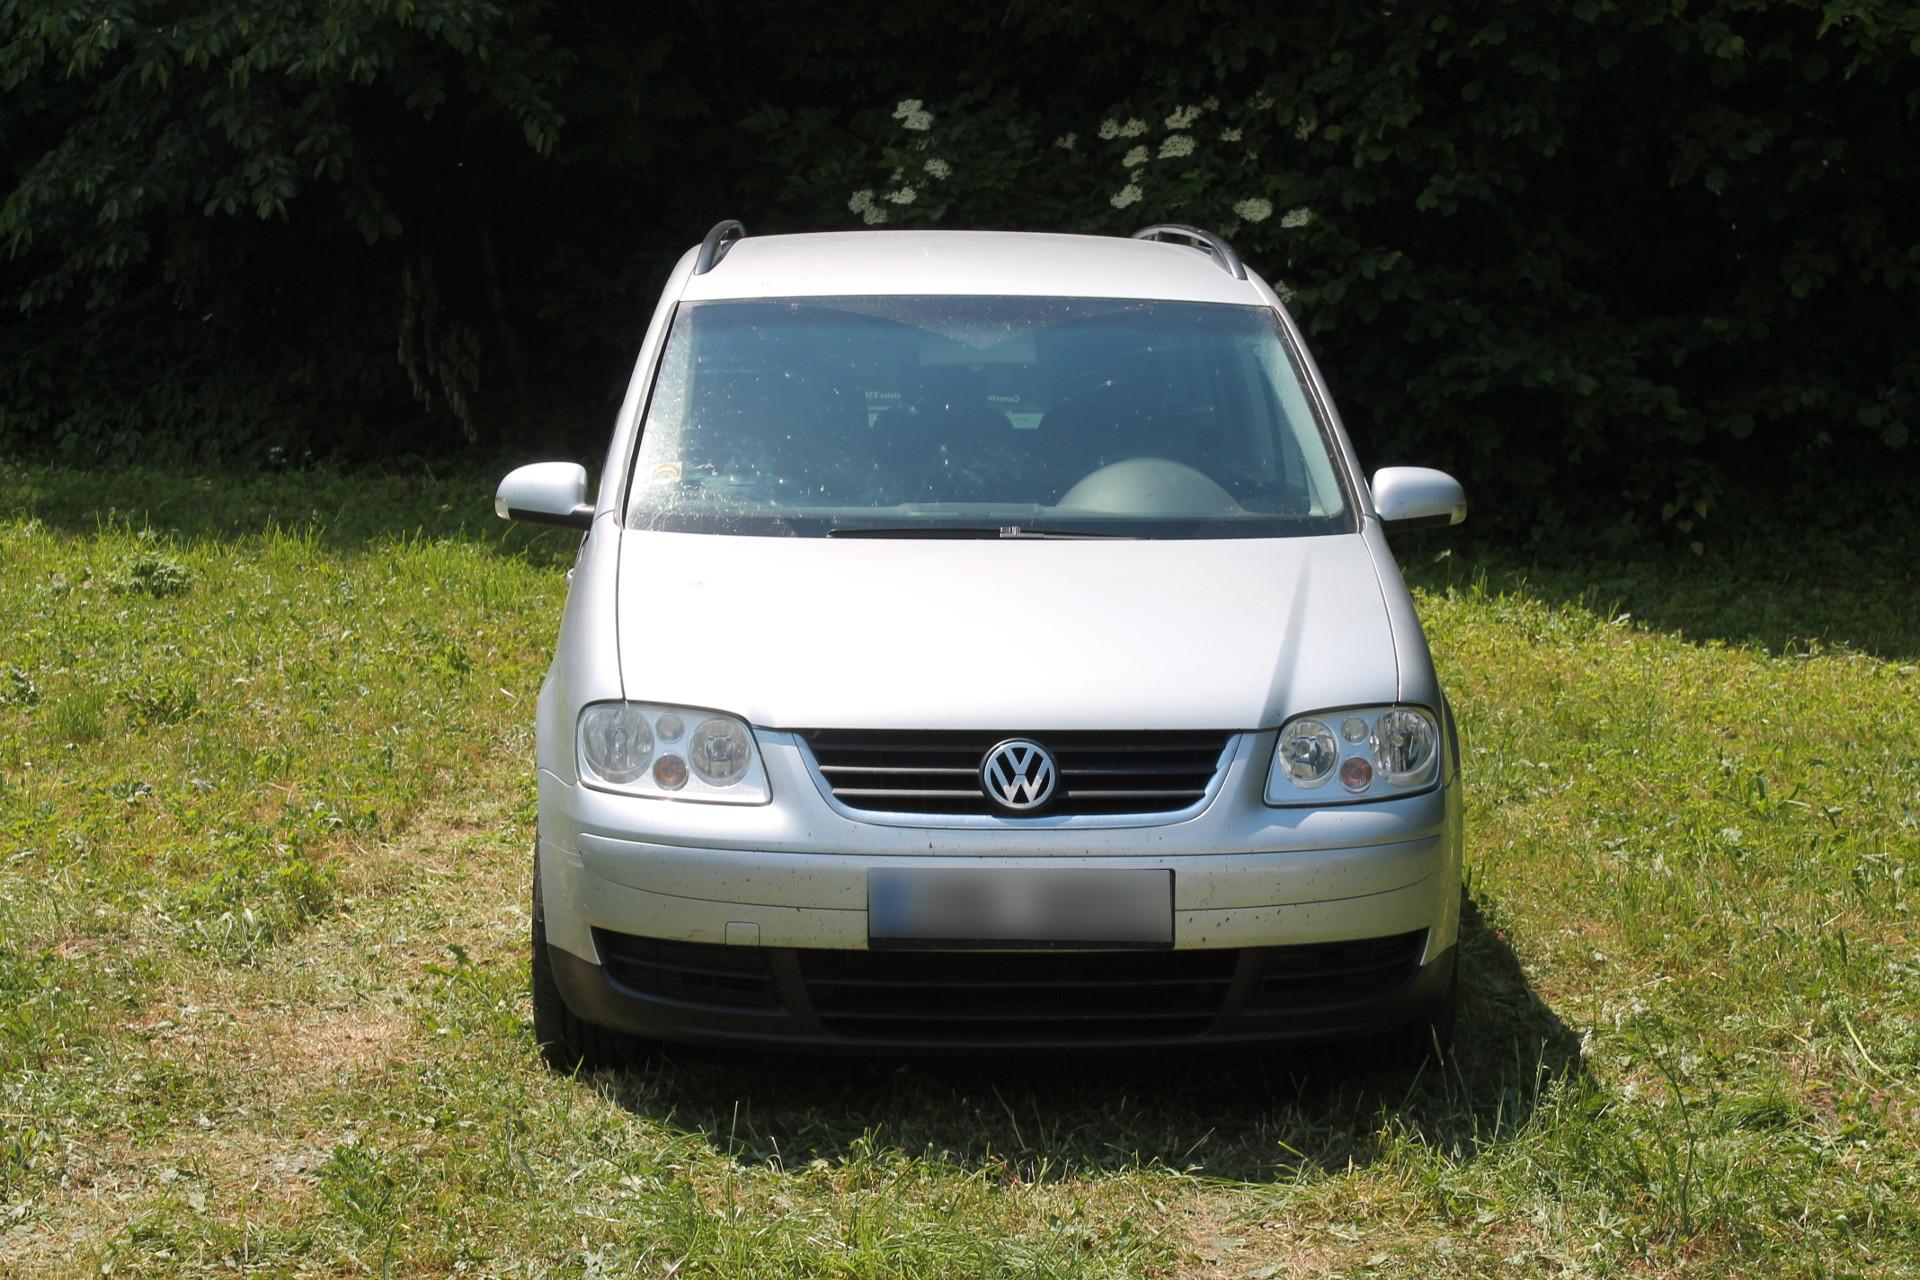 VW-osobák